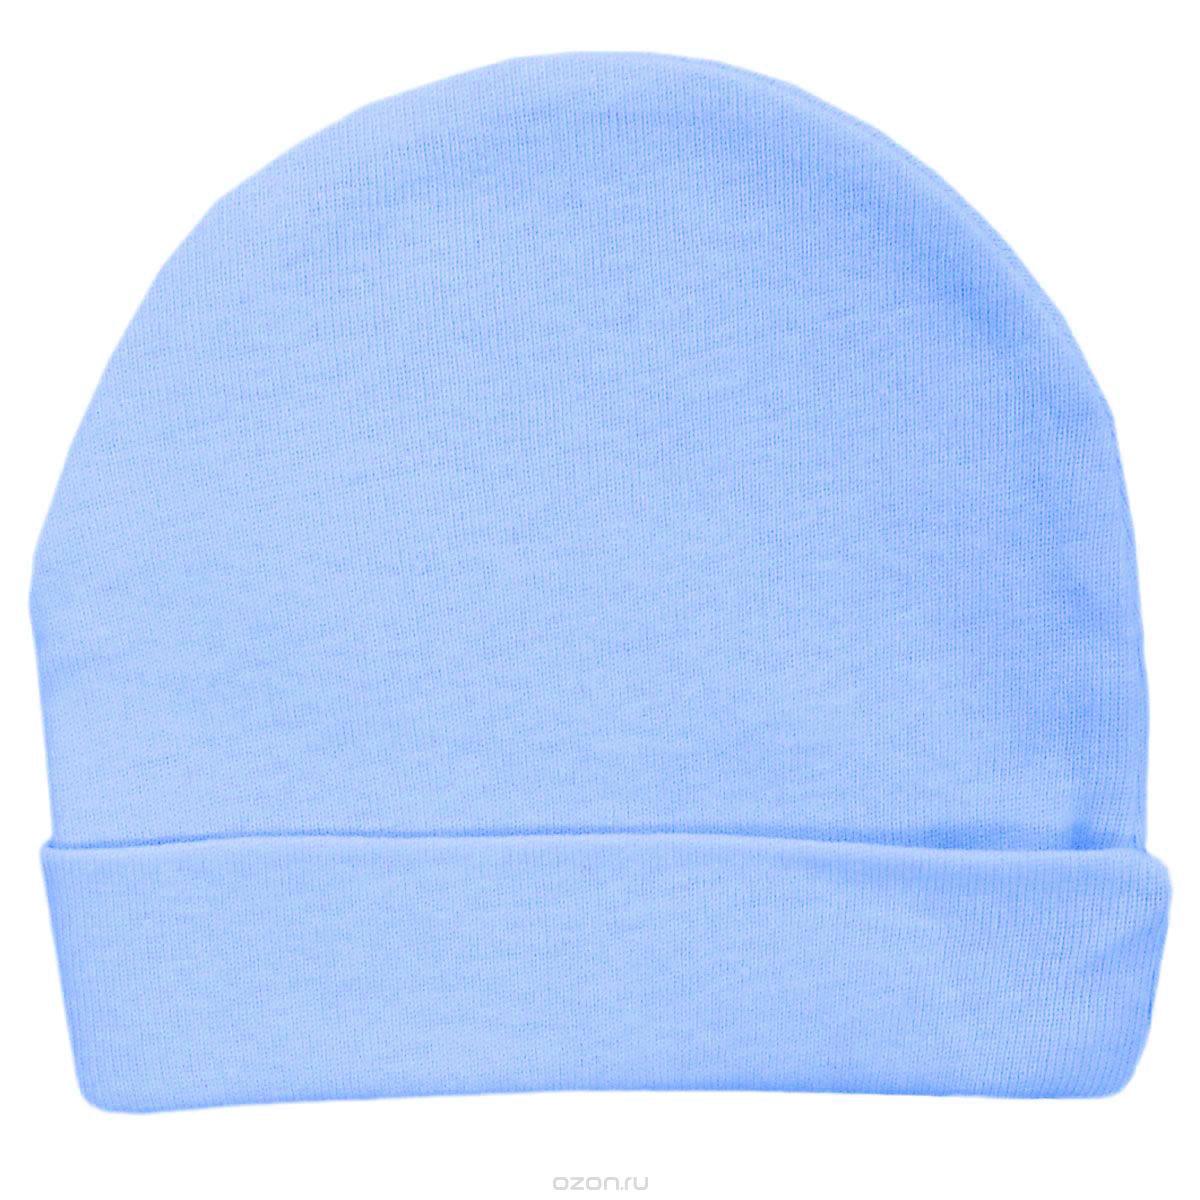 Шапочка унисекс Трон-Плюс, цвет: голубой. 6312. Размер 62, 3 месяца